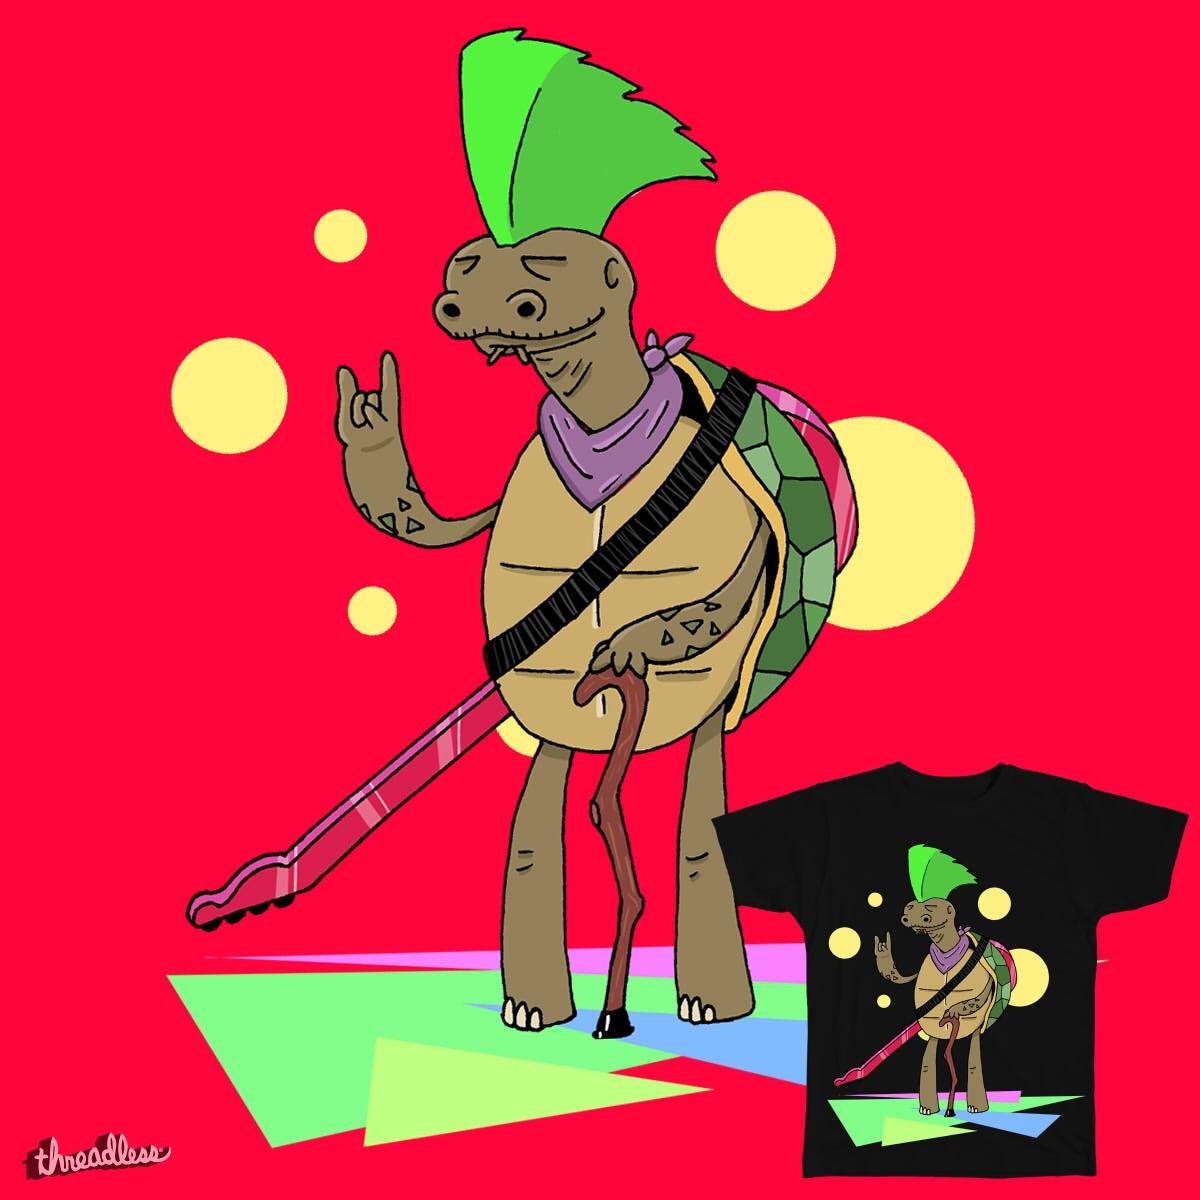 Old Mohawk Rocker by Dr_Donoh-onovan on Threadless